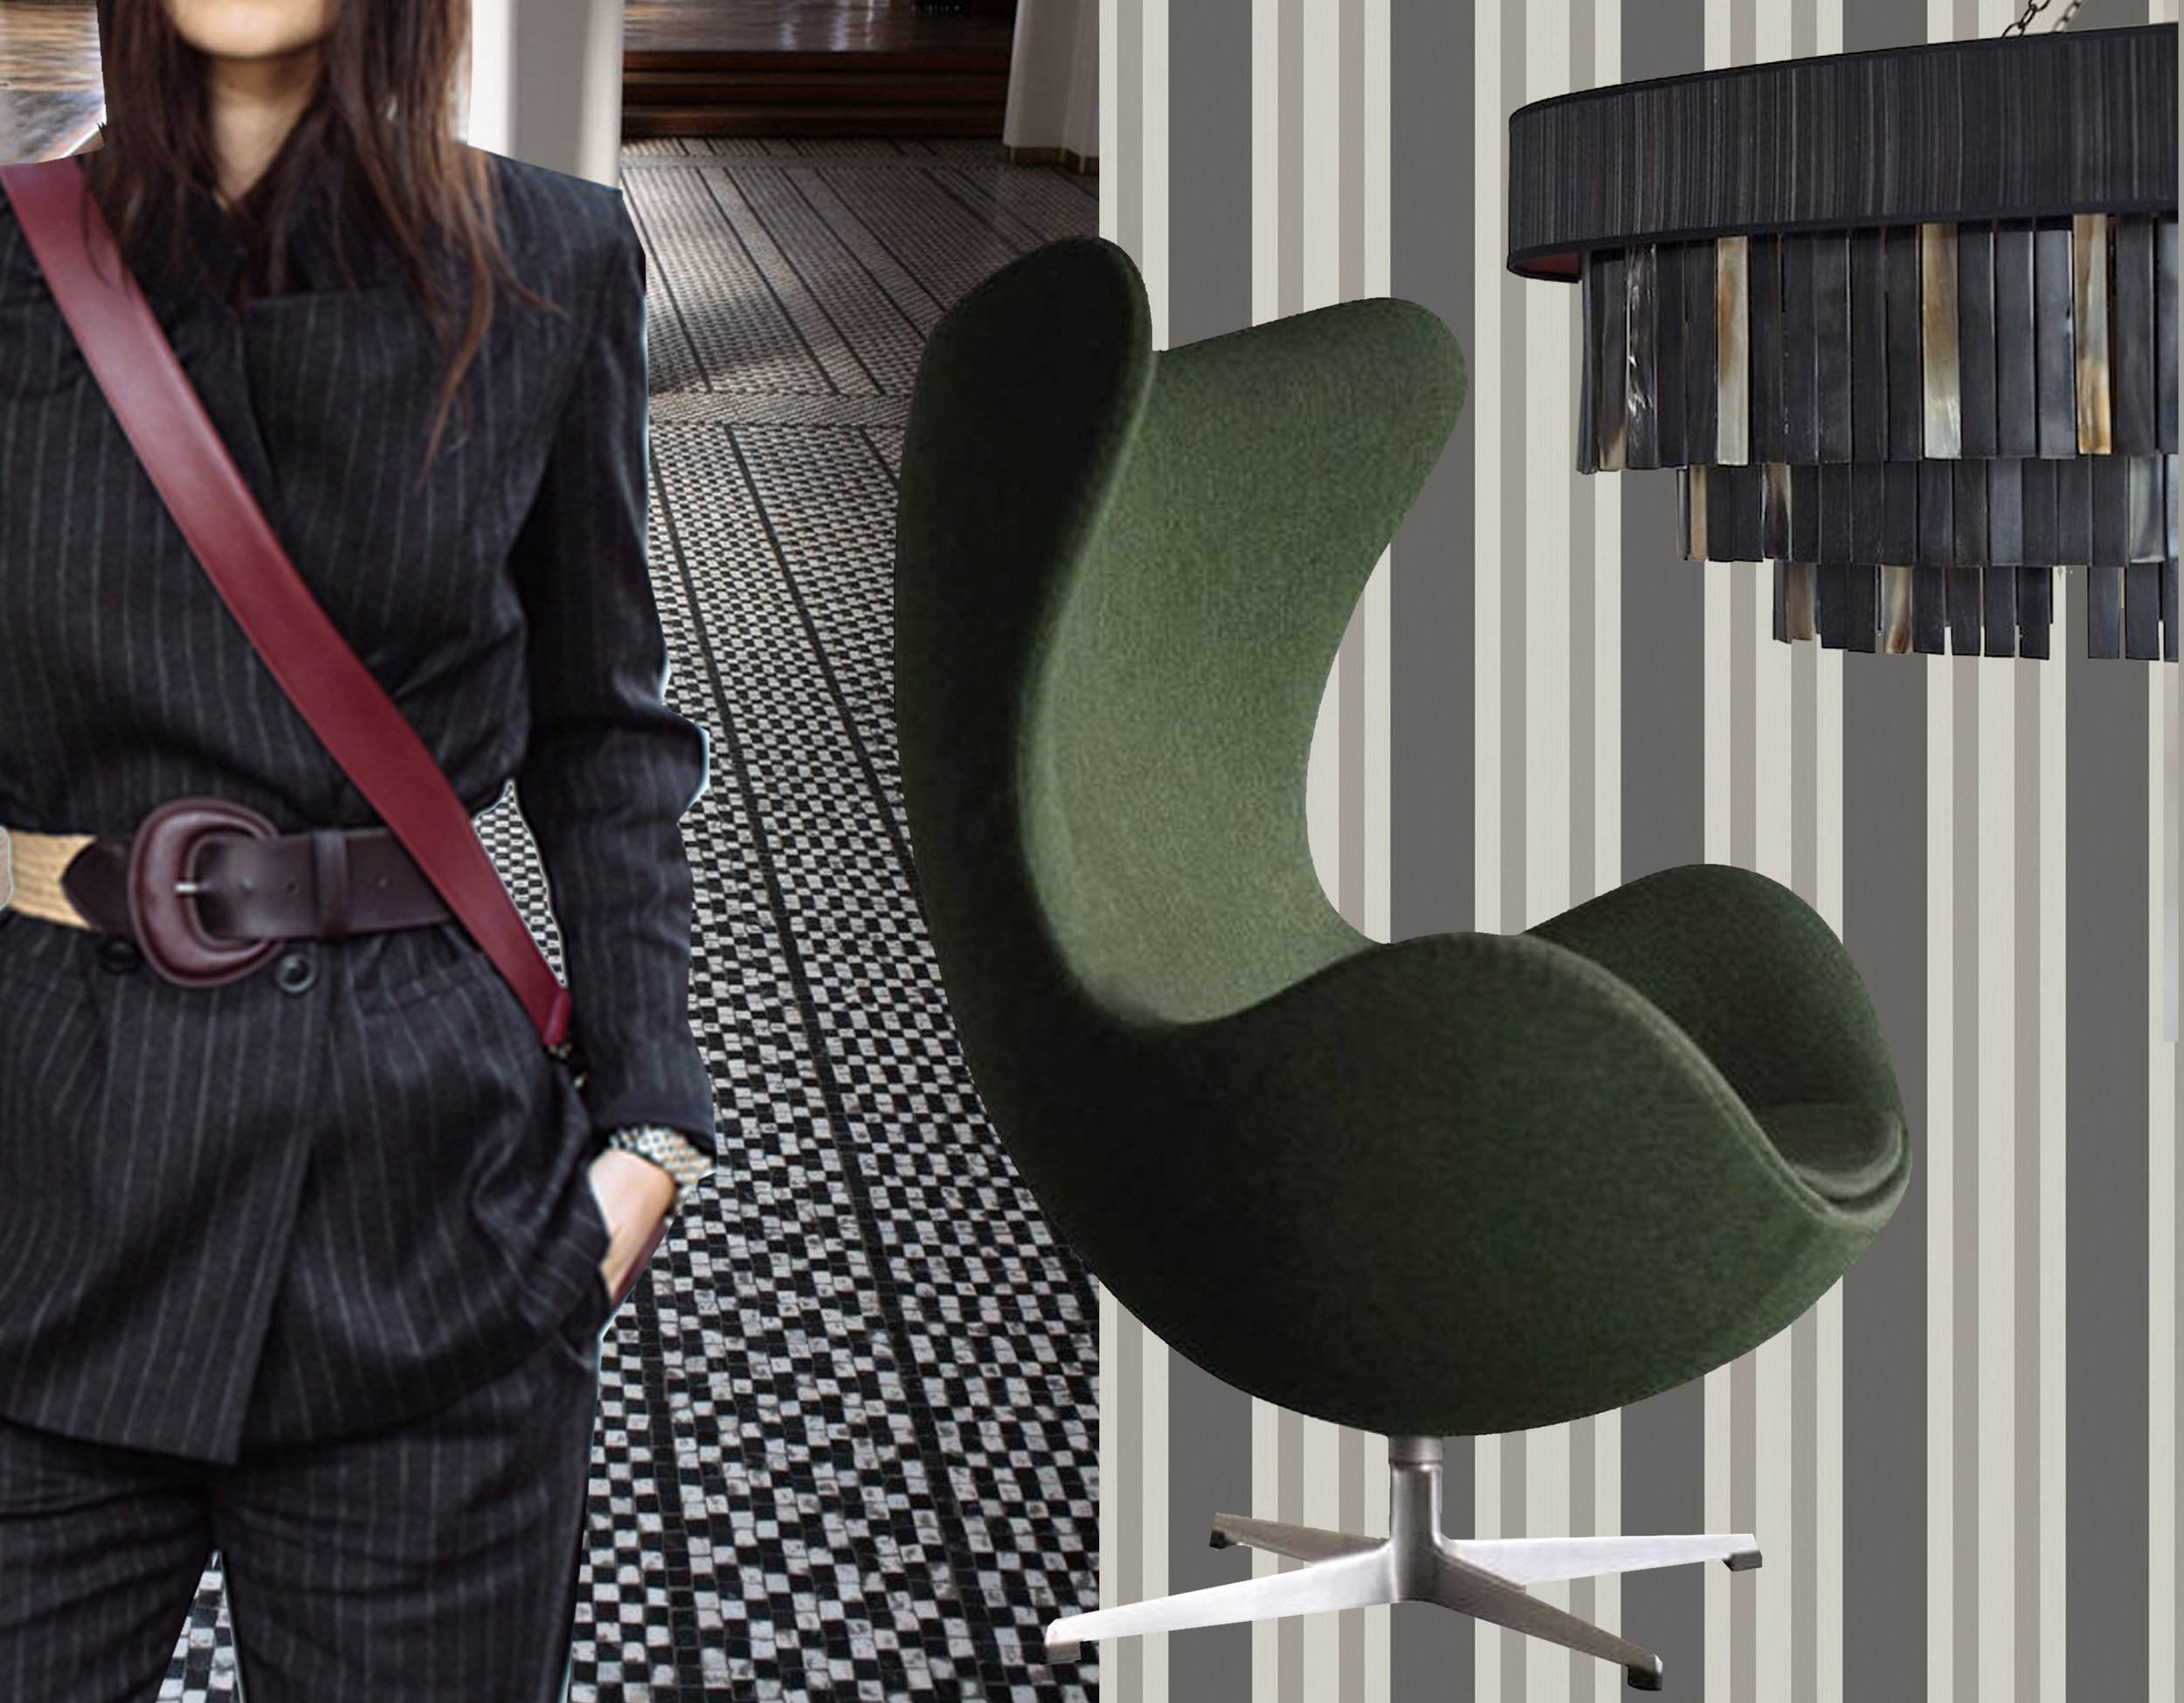 pin stripe suit via  Steal the Look  - floor Arne Jacobsen for  Aarhus city hall  - Egg chair Arne Jacobsen via  1stDibs  - Polo Stripe wallpaper  Cole & Son  - Eclipse chandelier  Ocre